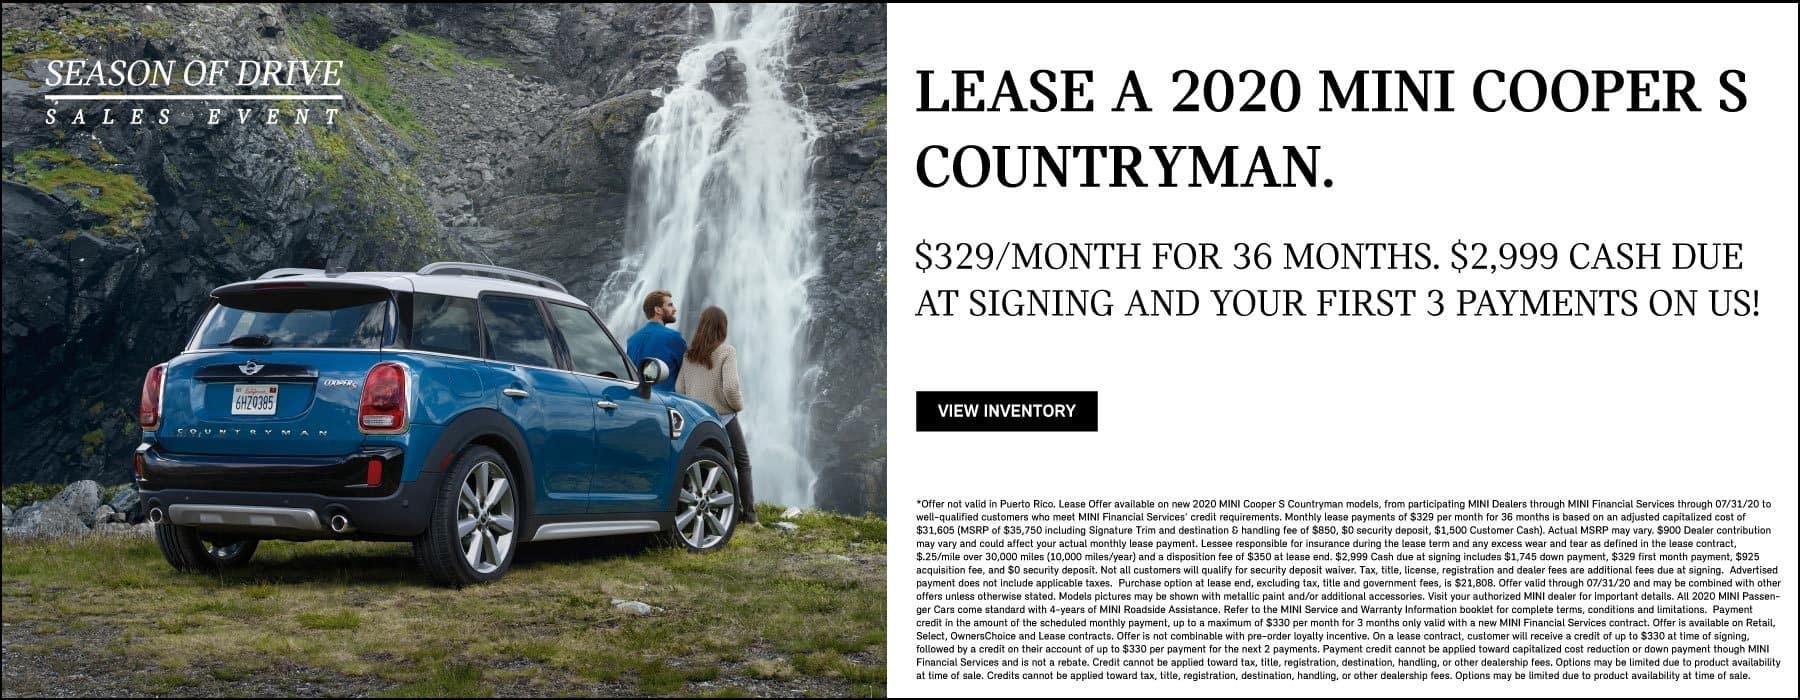 2020 MINI Cooper S Countryman Lease offer